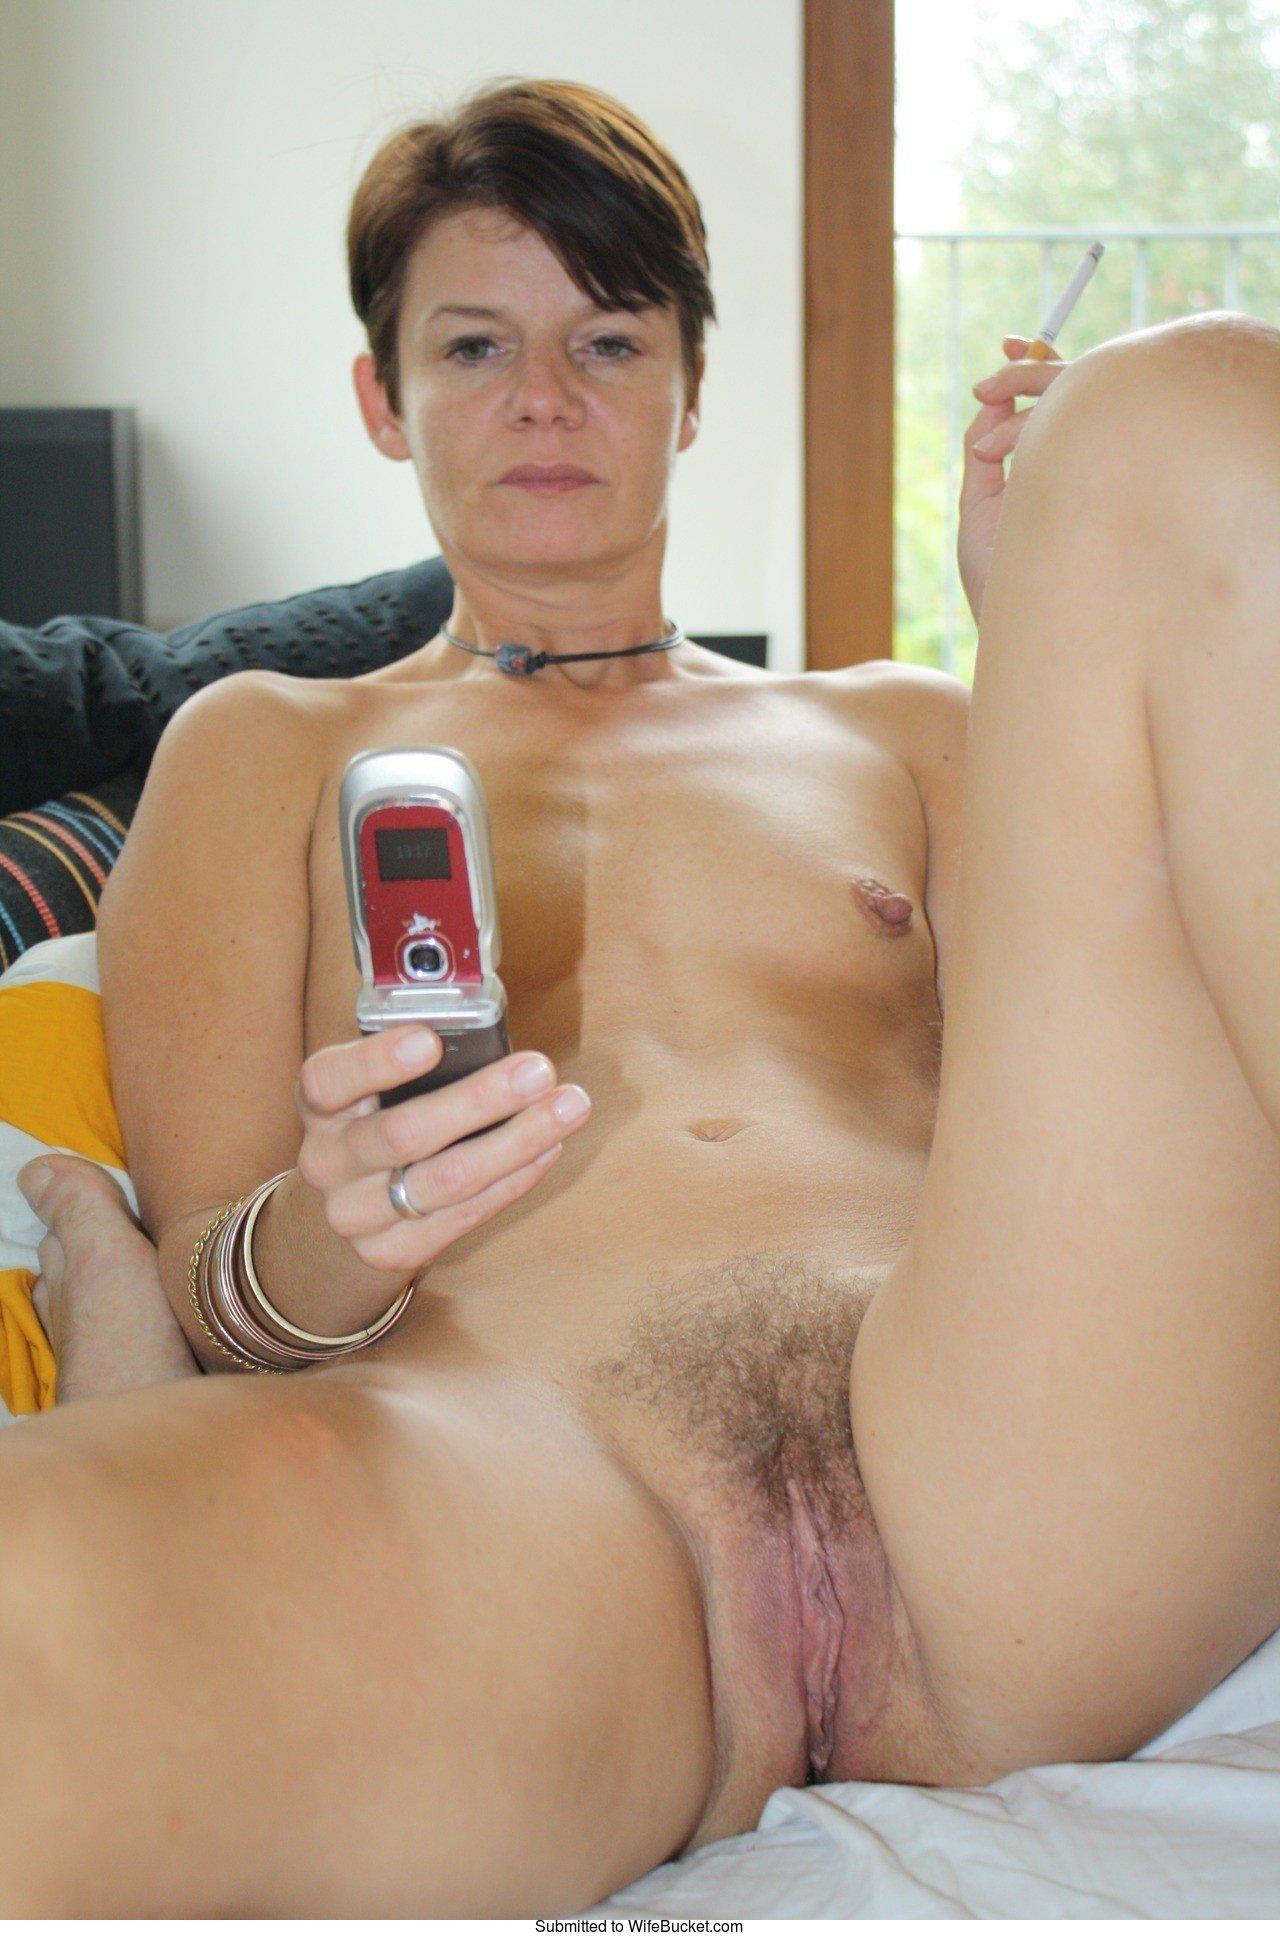 Wifebucket  Mature Women And Their Naughty Naked Selfies-9268